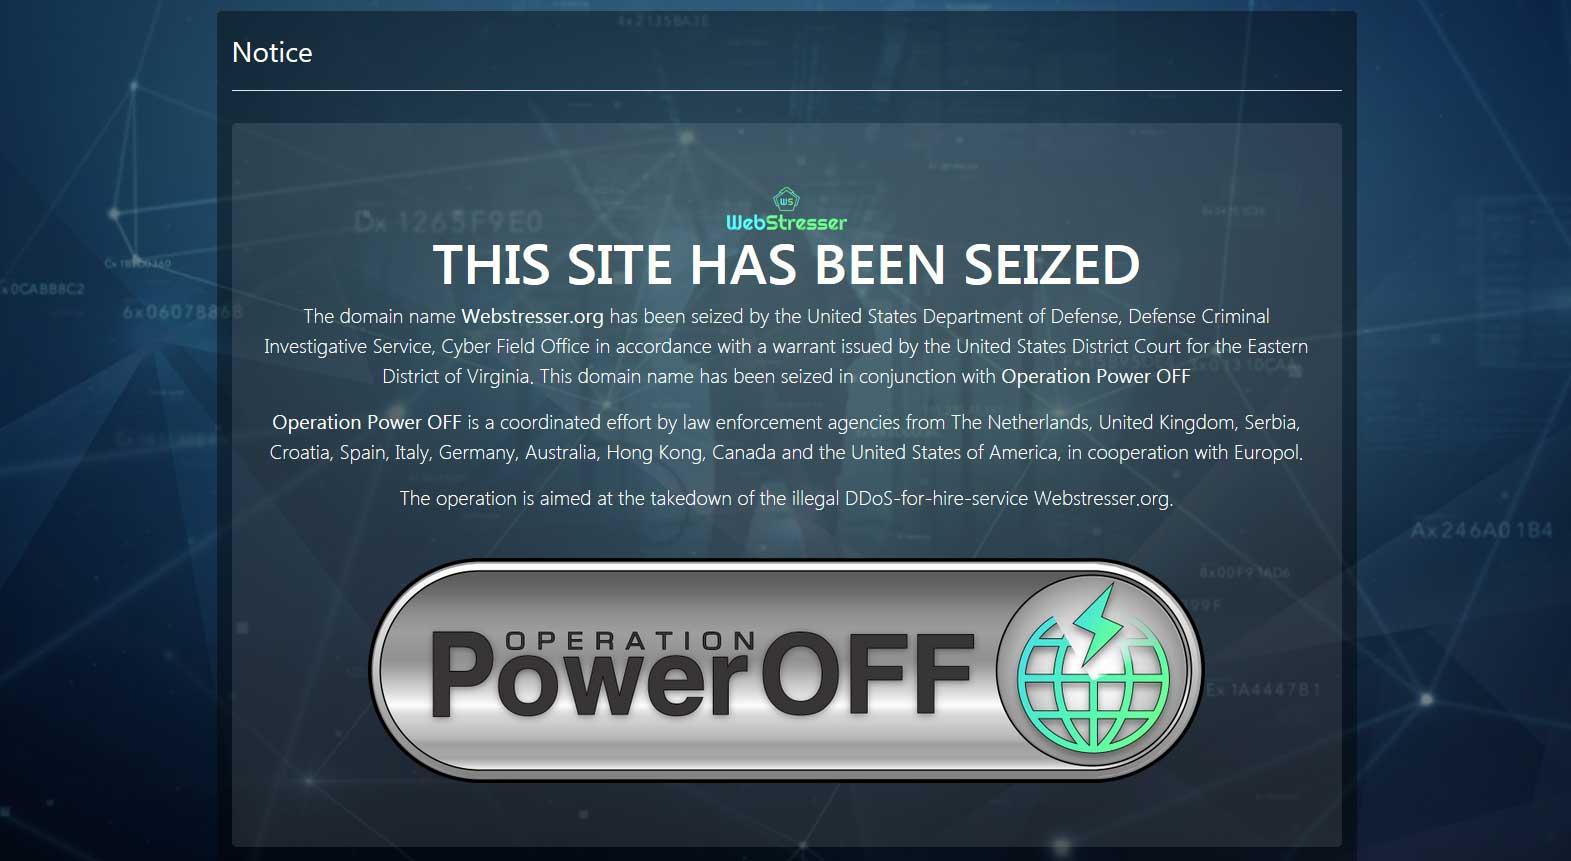 Notice on Webstresser.org